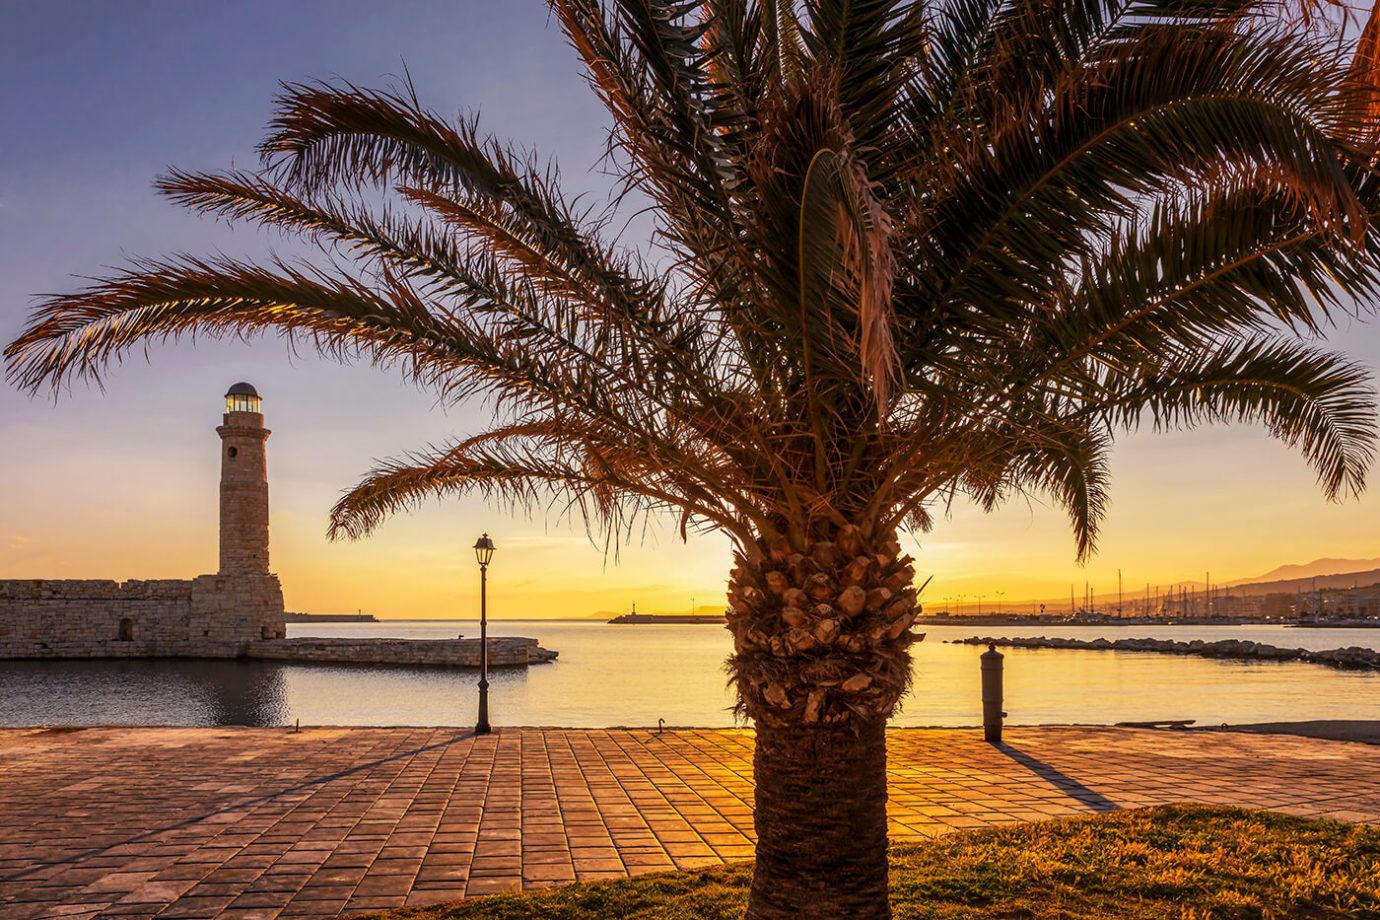 Sunrise, Lighthouse, Rethymno, Crete, Greece